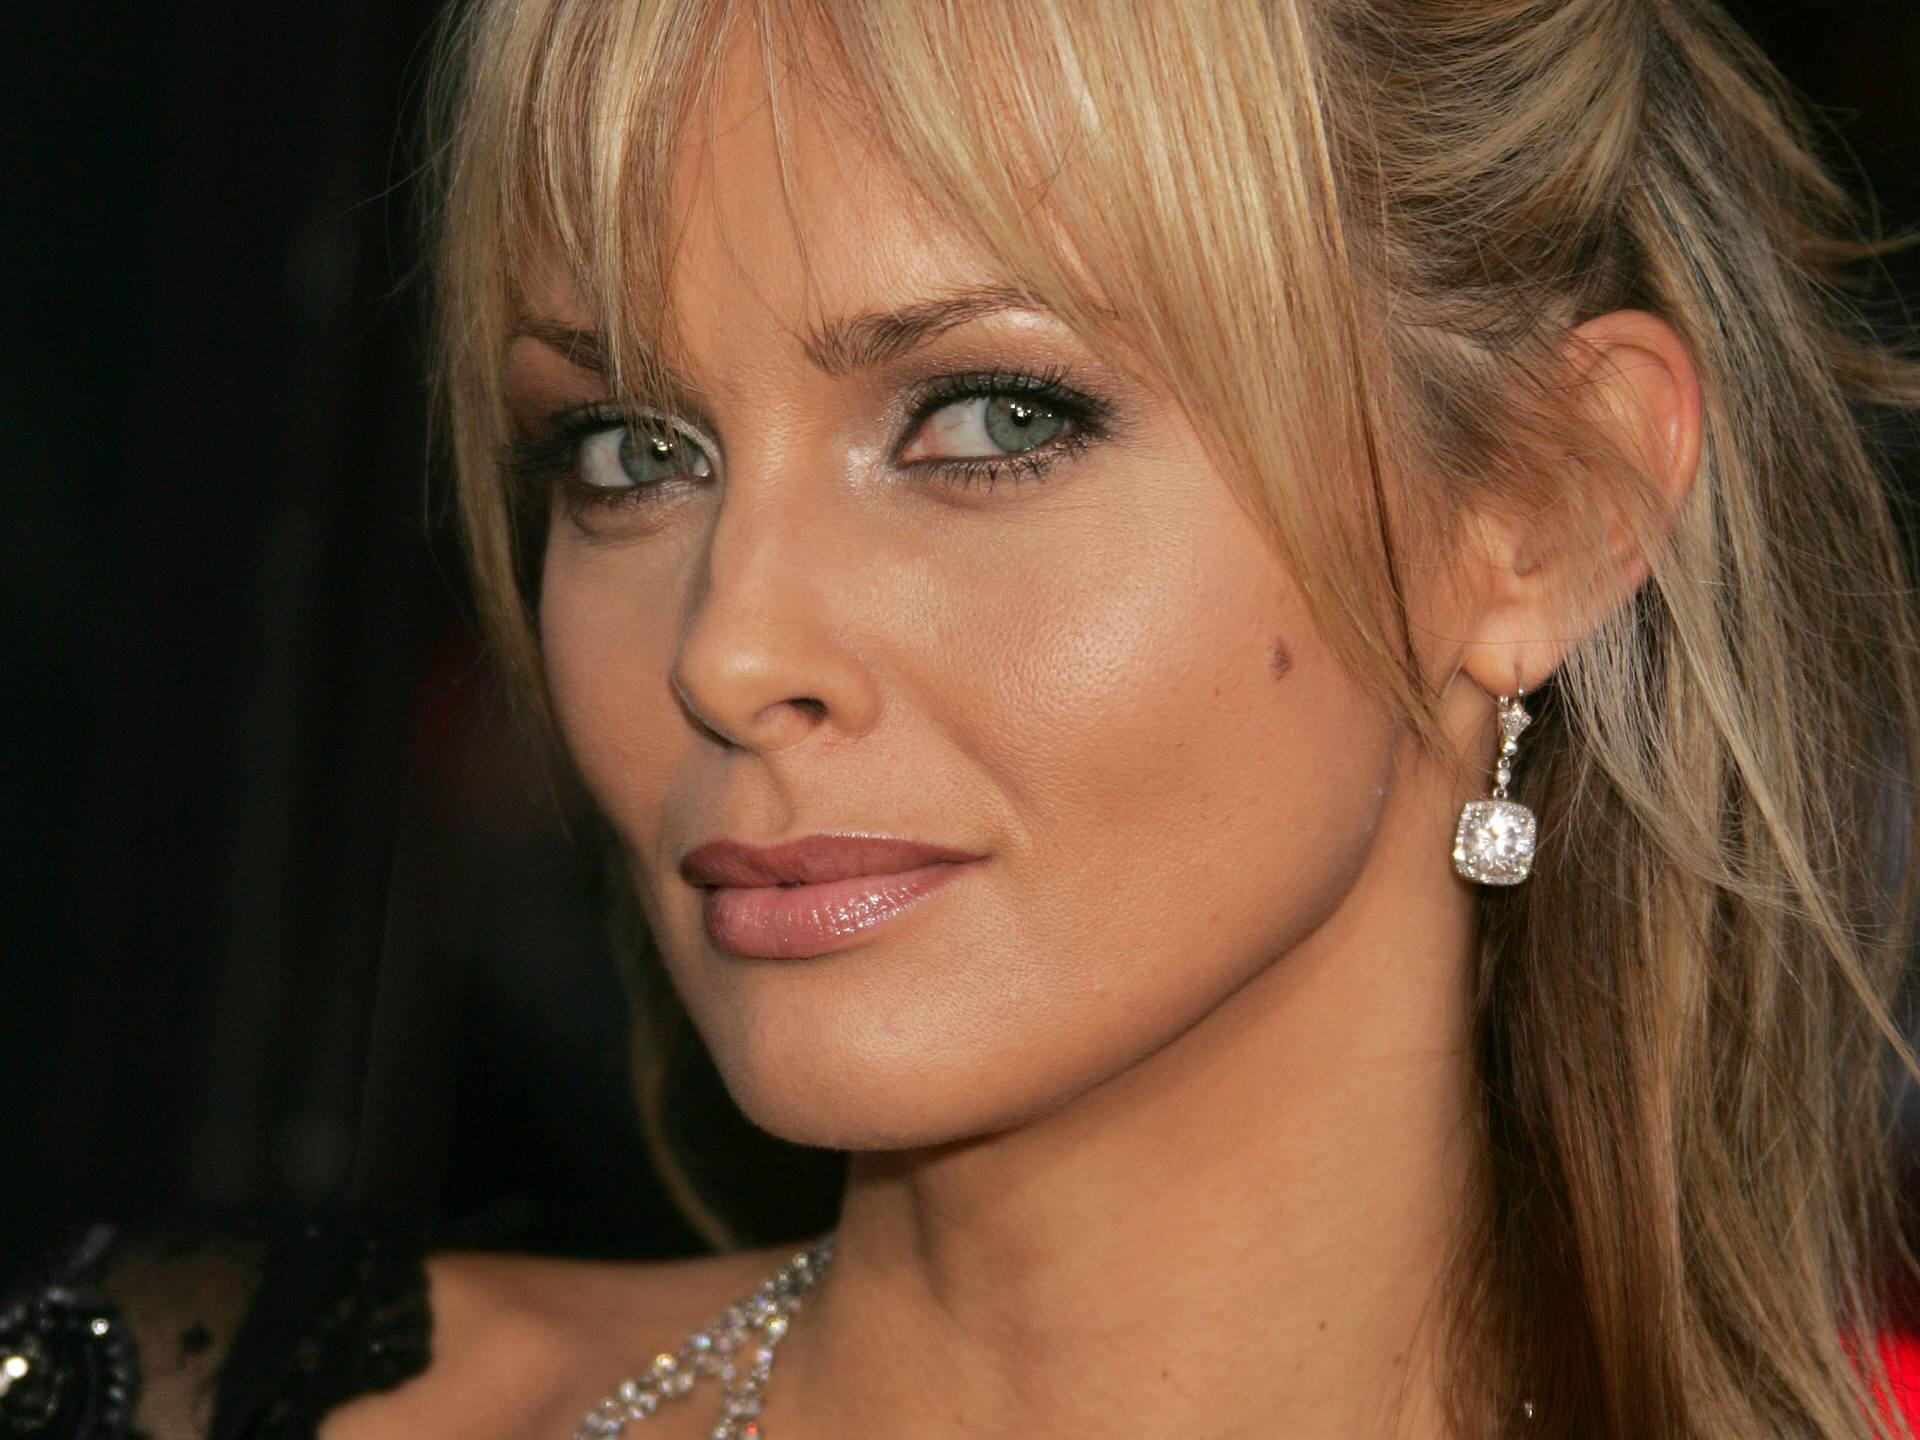 jenna jameson videos polish escort uk